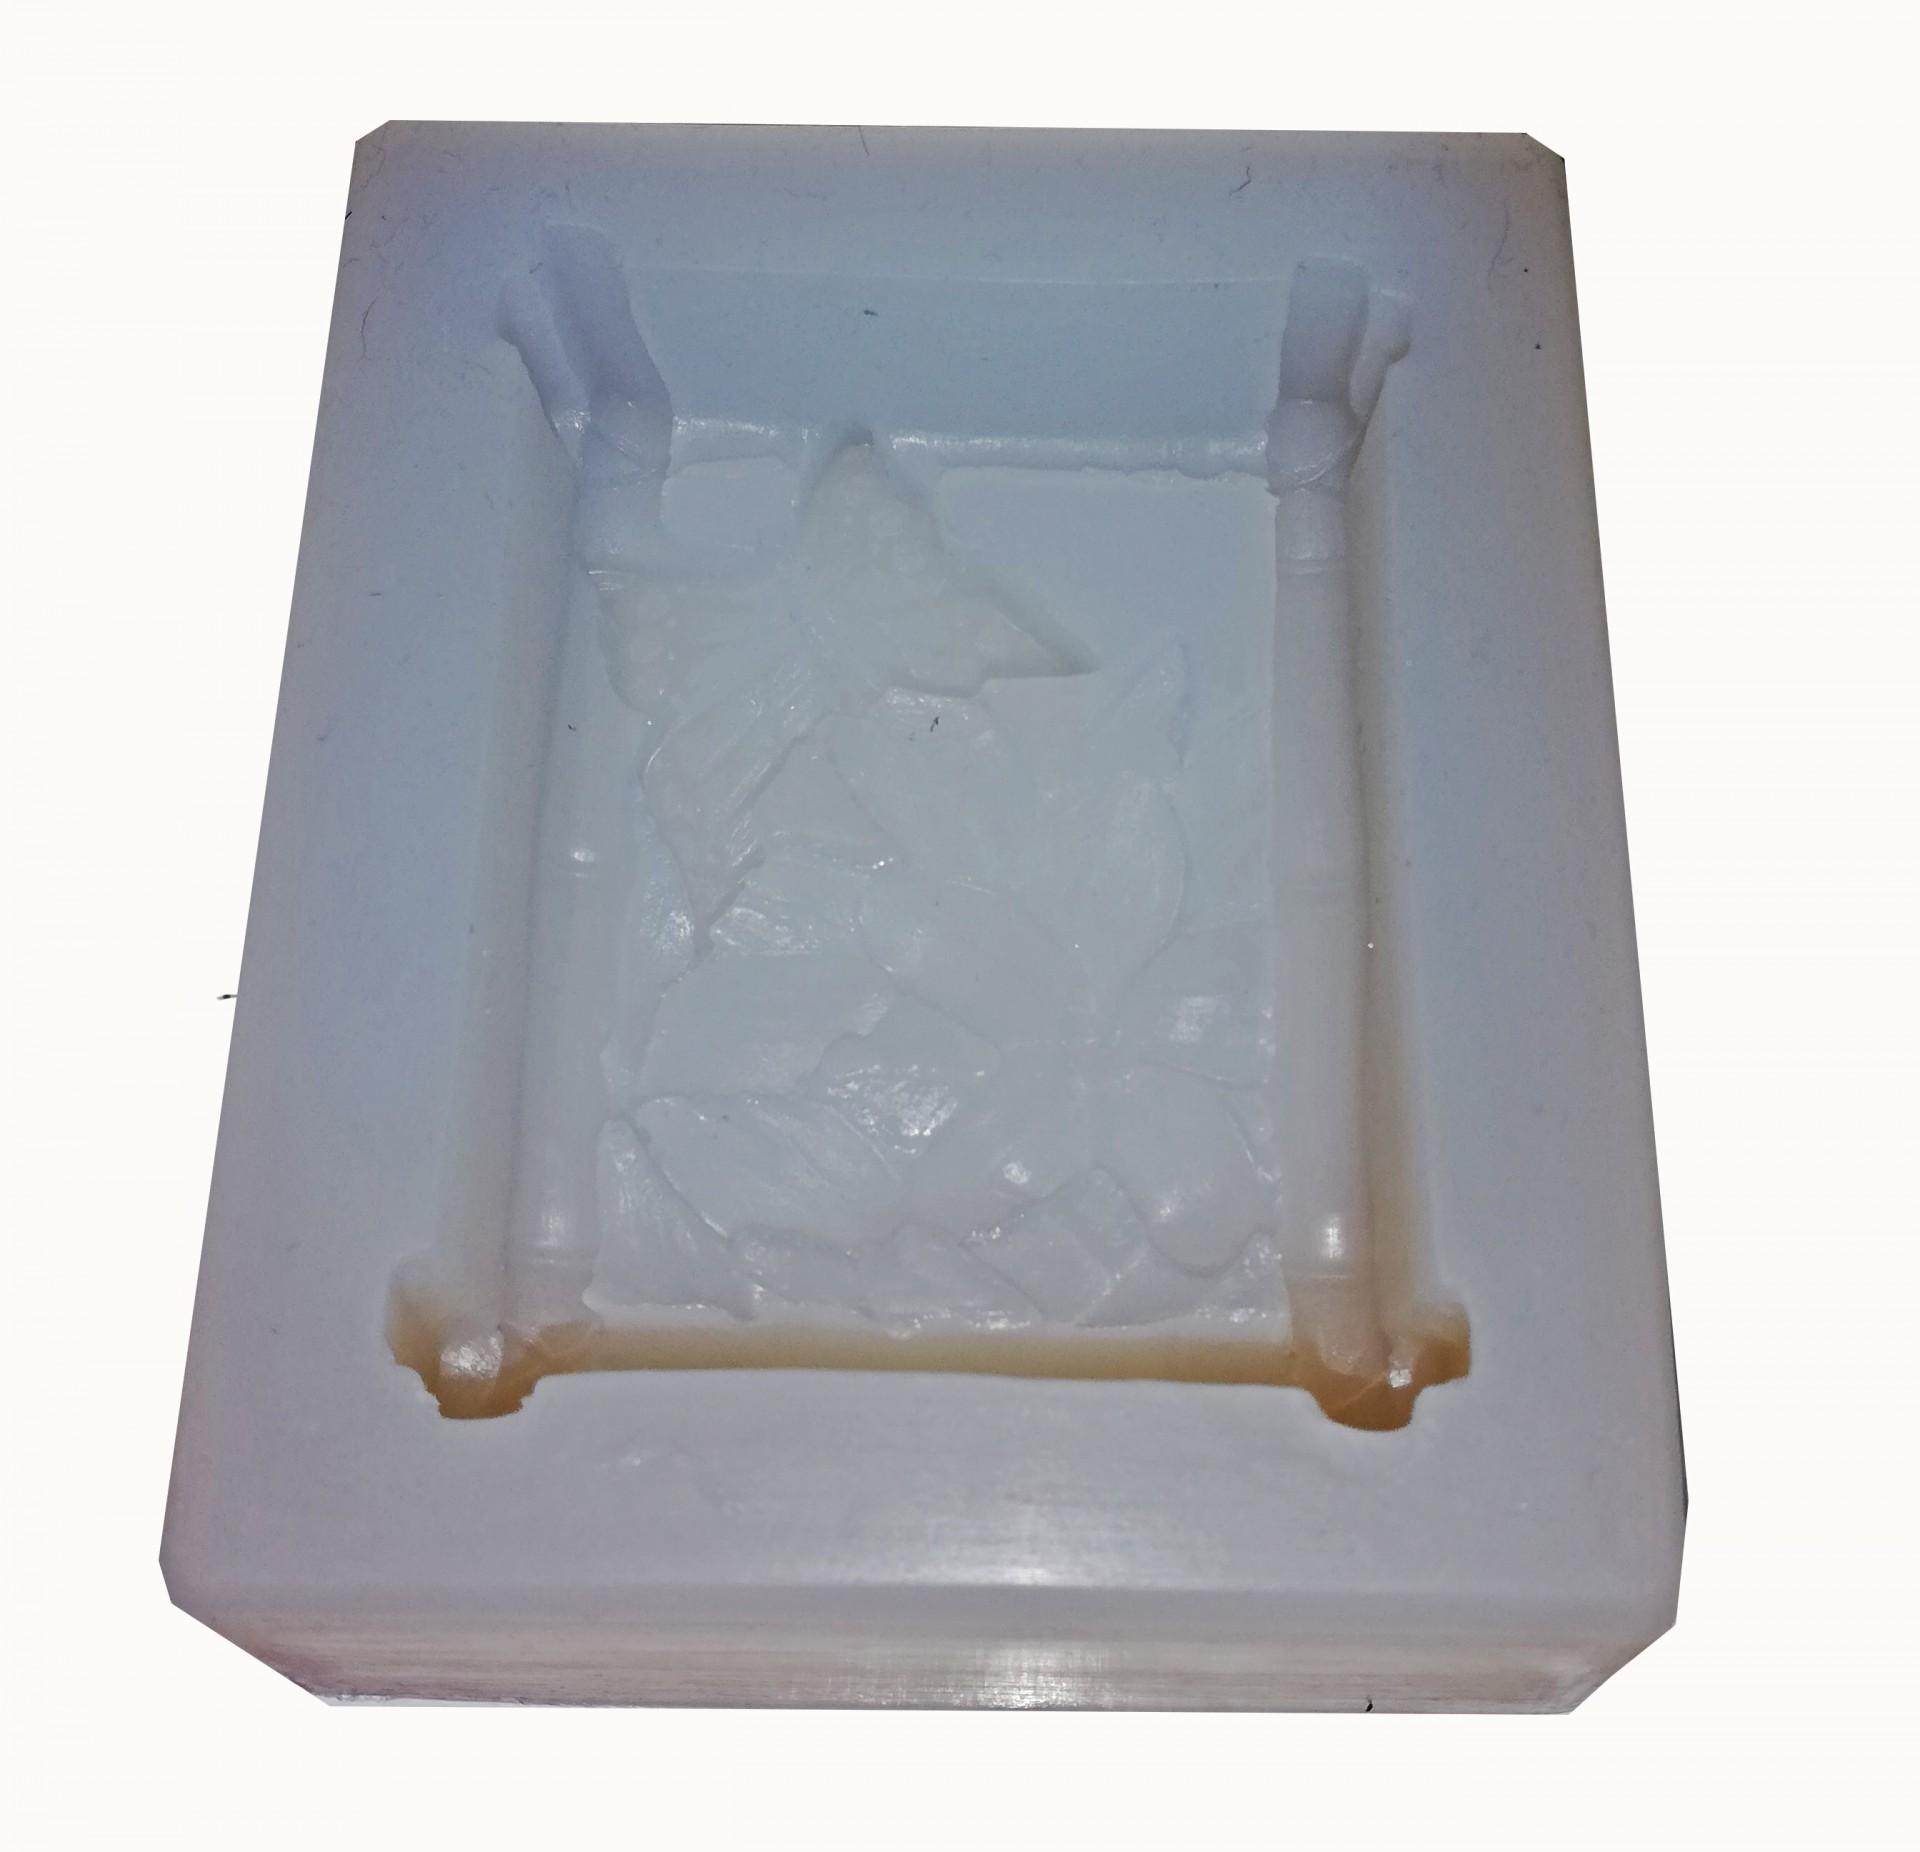 Molde Silicone modelo com Canteiro e Borboleta (para velas ou sabonetes)